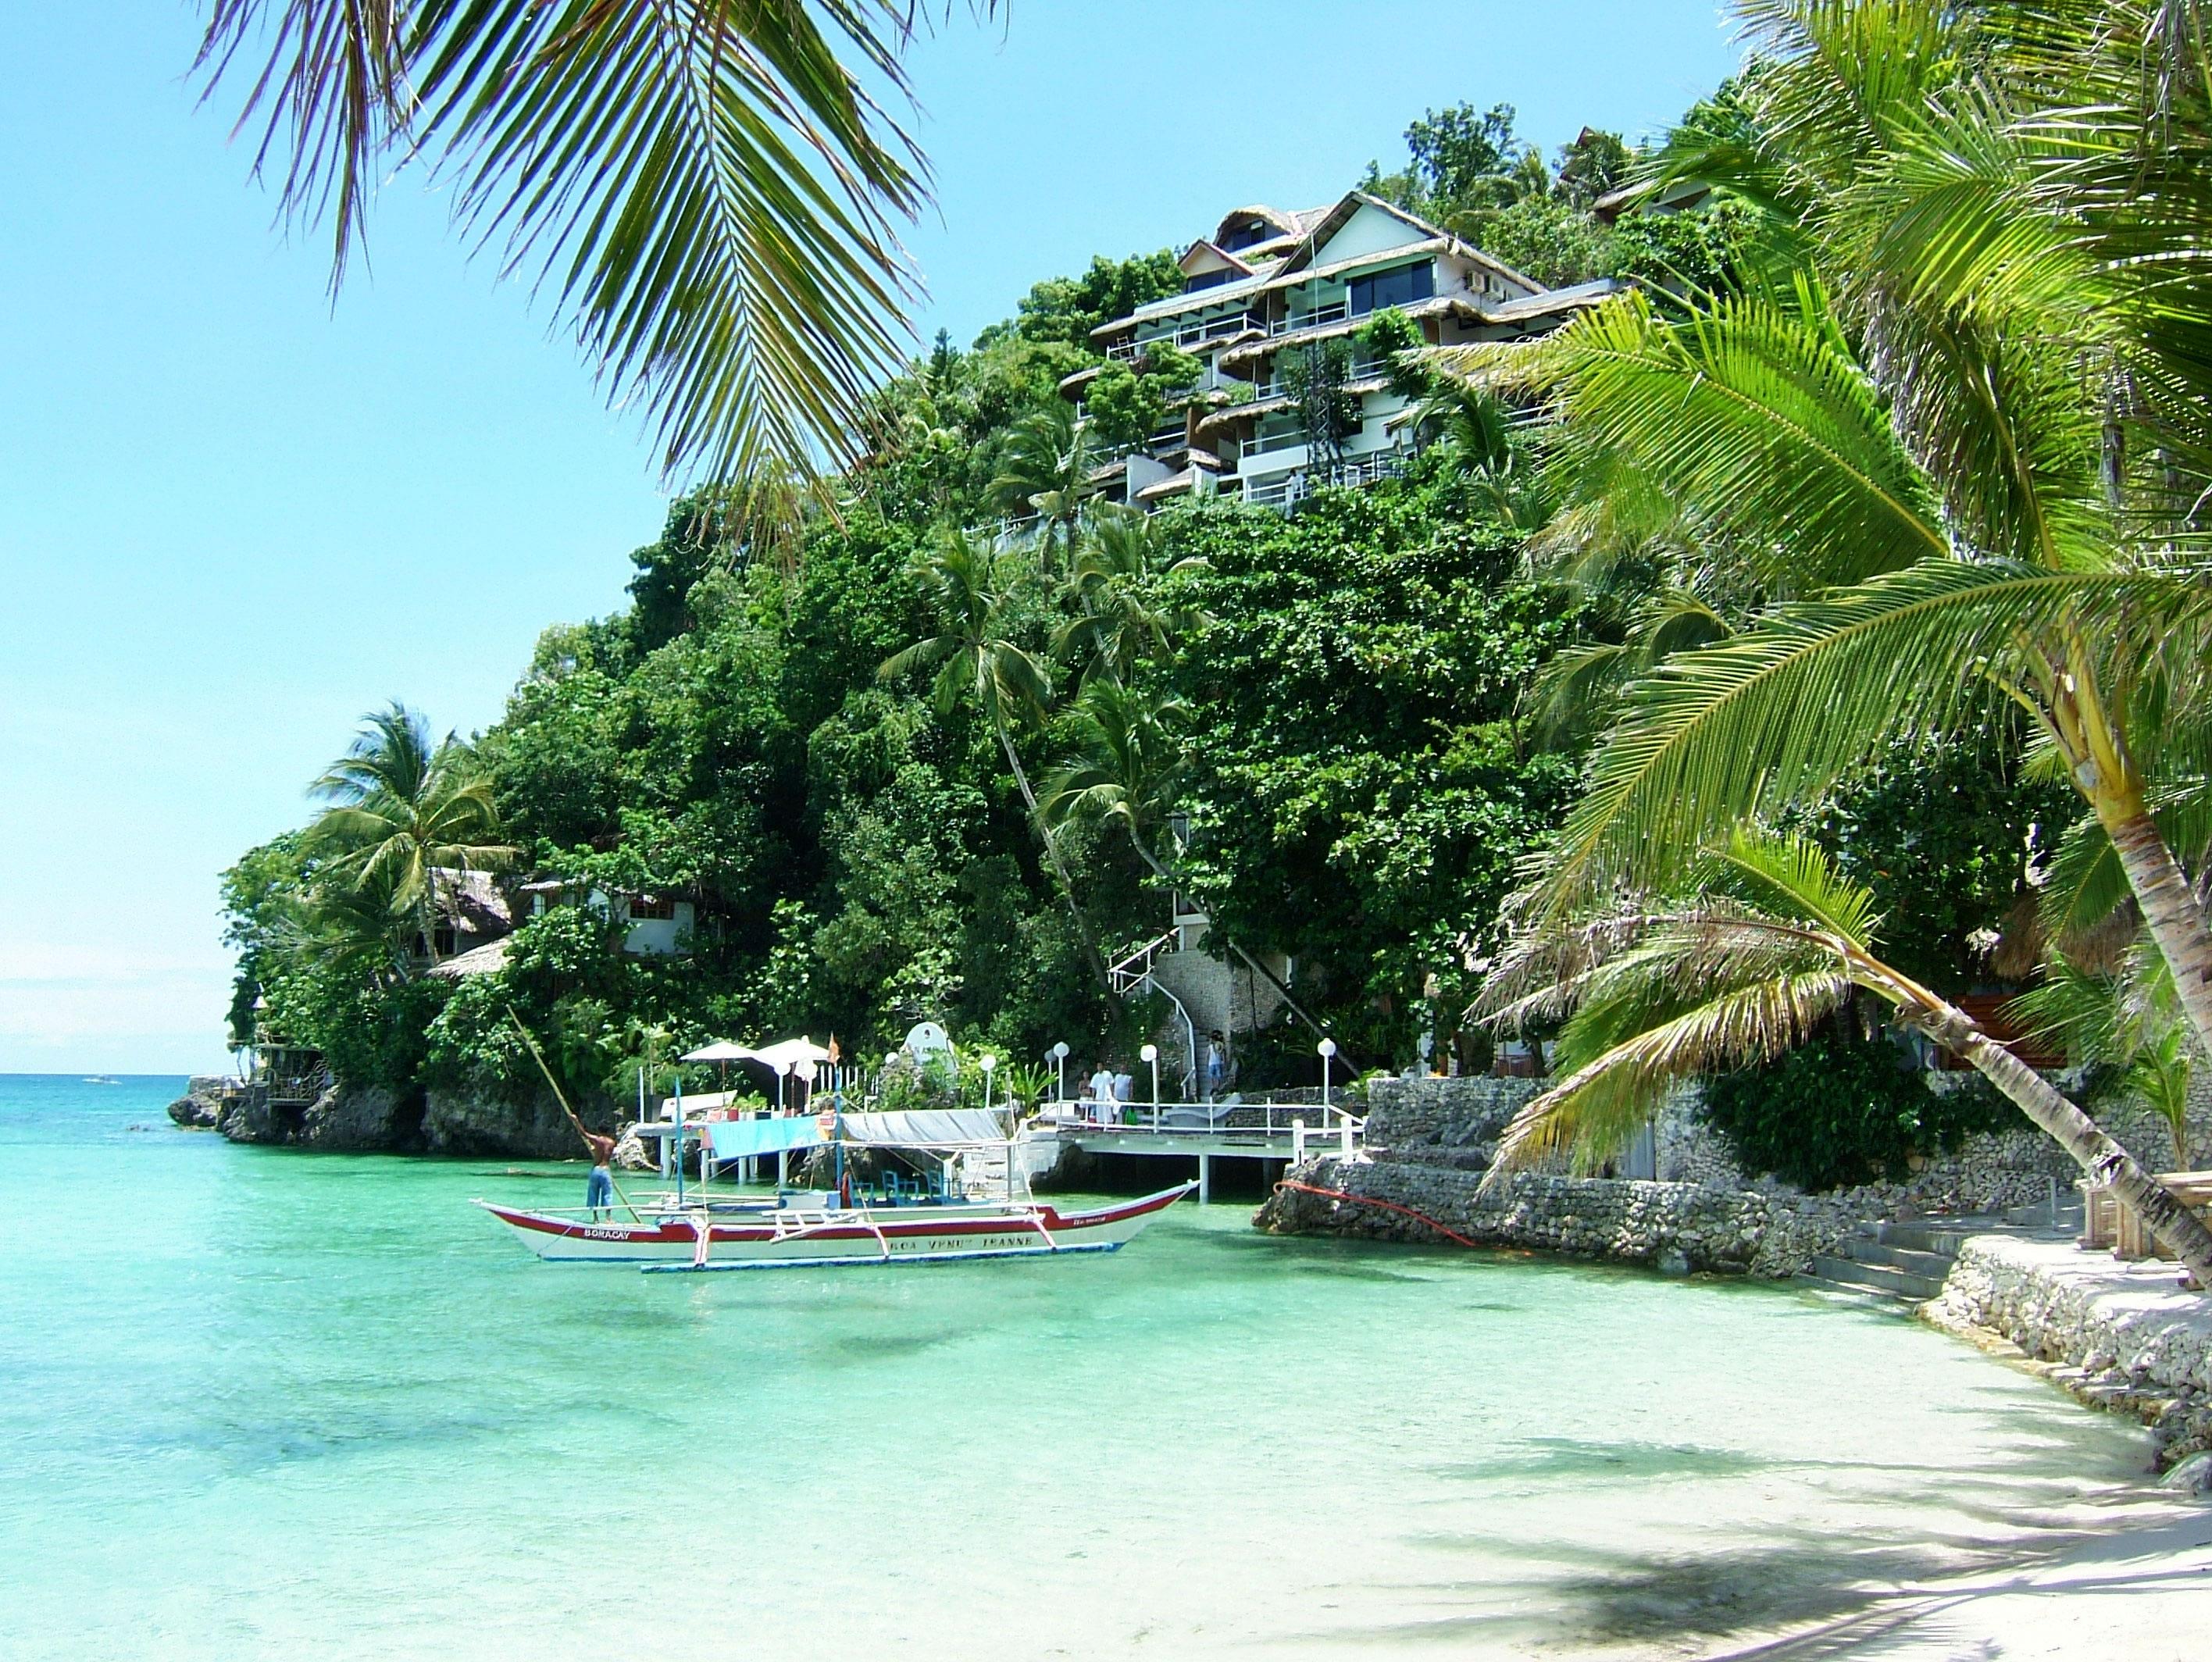 Philippines Sugar Islands Boracay Punta bunga beach Resorts 2007 12